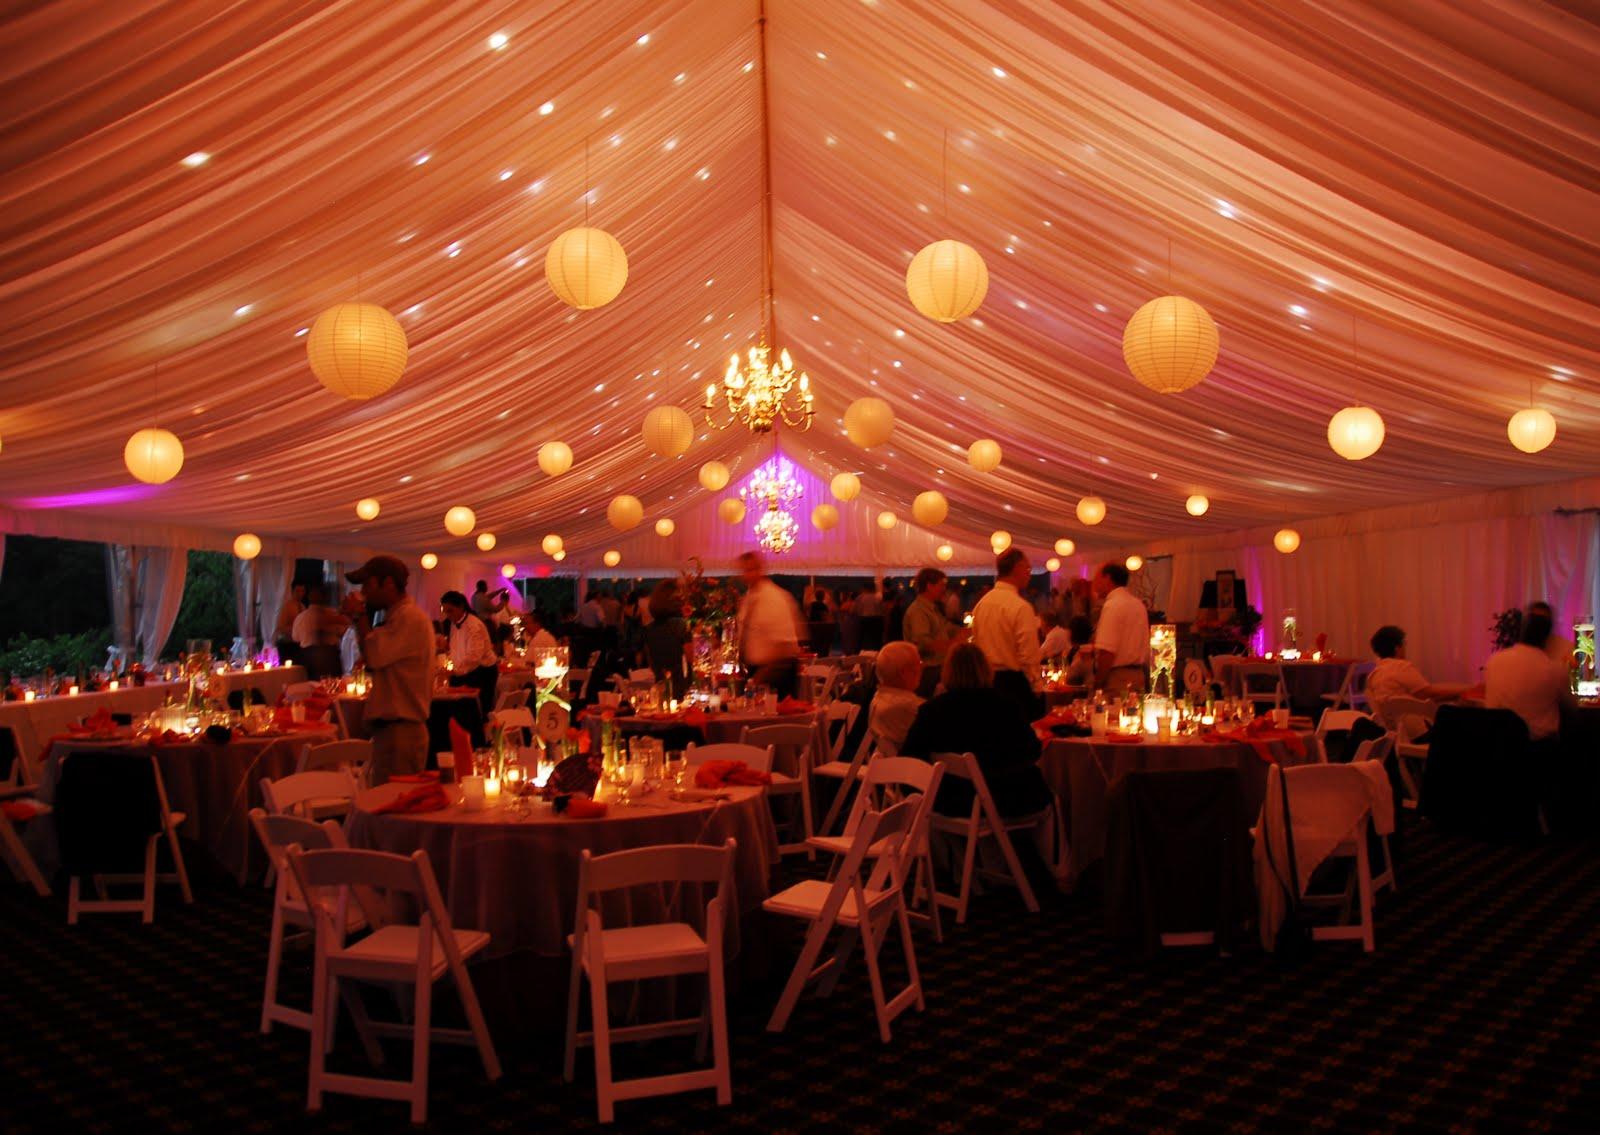 Top 5 Wedding Venues in Philadelphia - ShutterBooth Photo ...